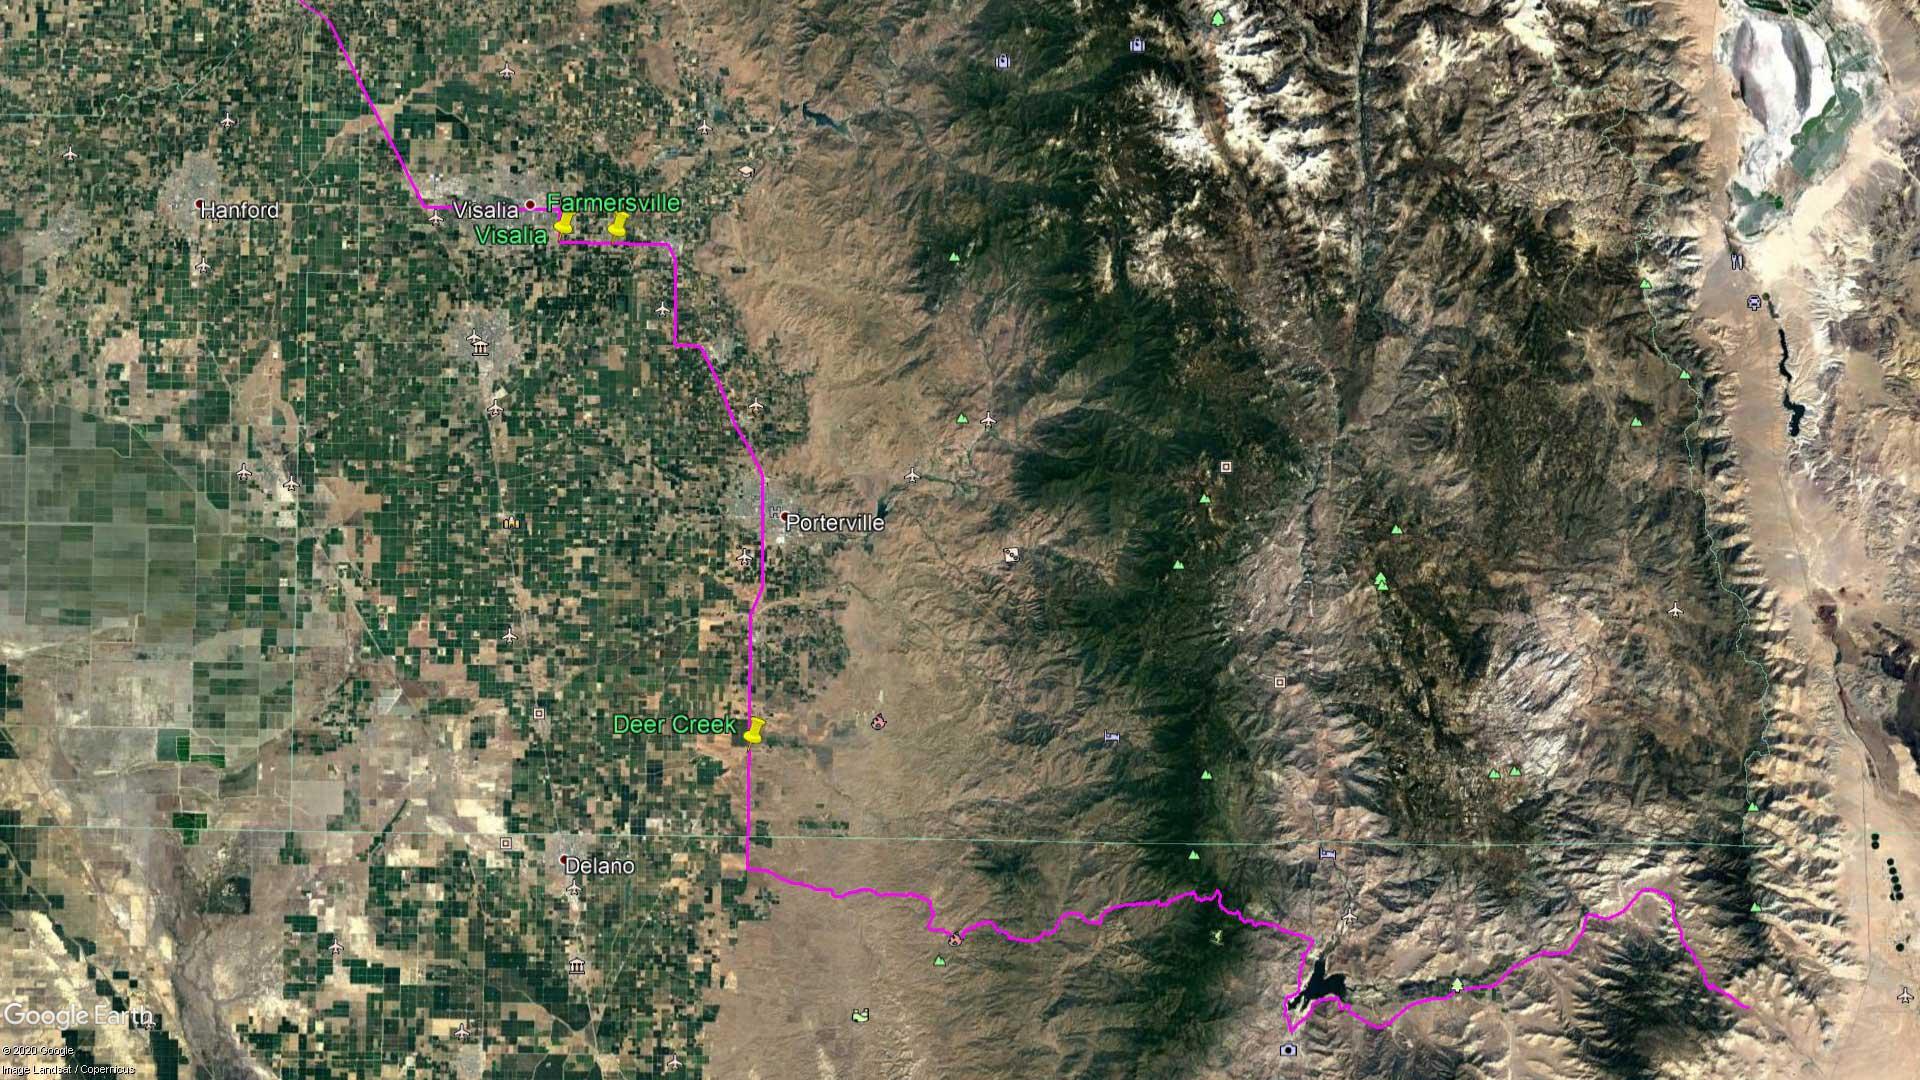 May 14, 1870 - The San Joaquin Valley